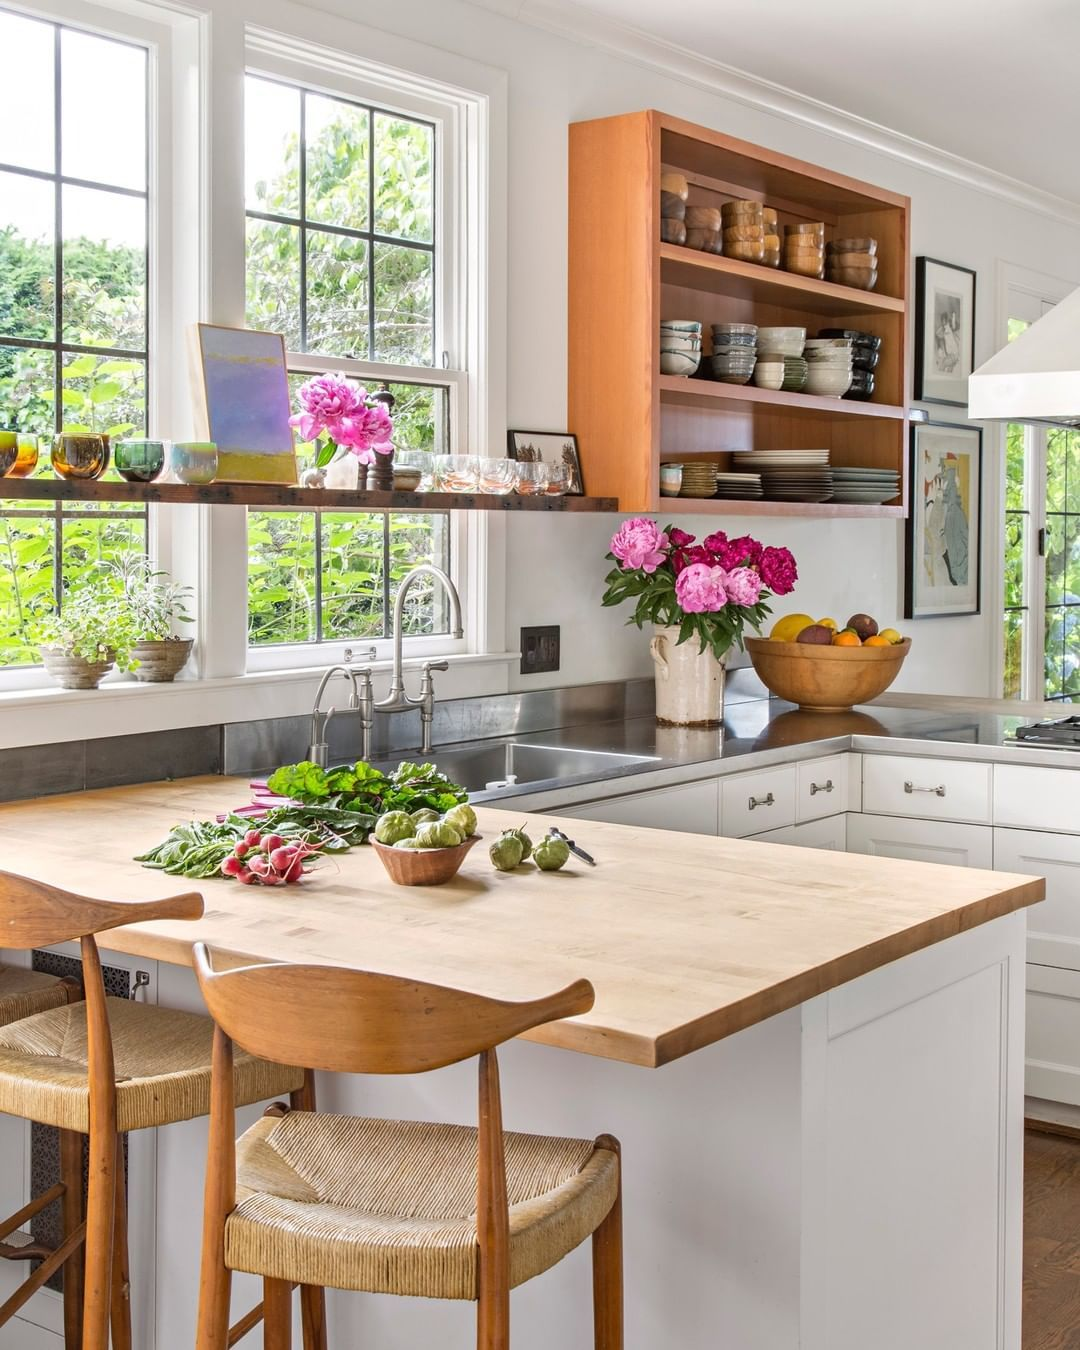 b22b50b289a886d94b7b369999f94669 - Heidi Caillier Better Homes And Gardens